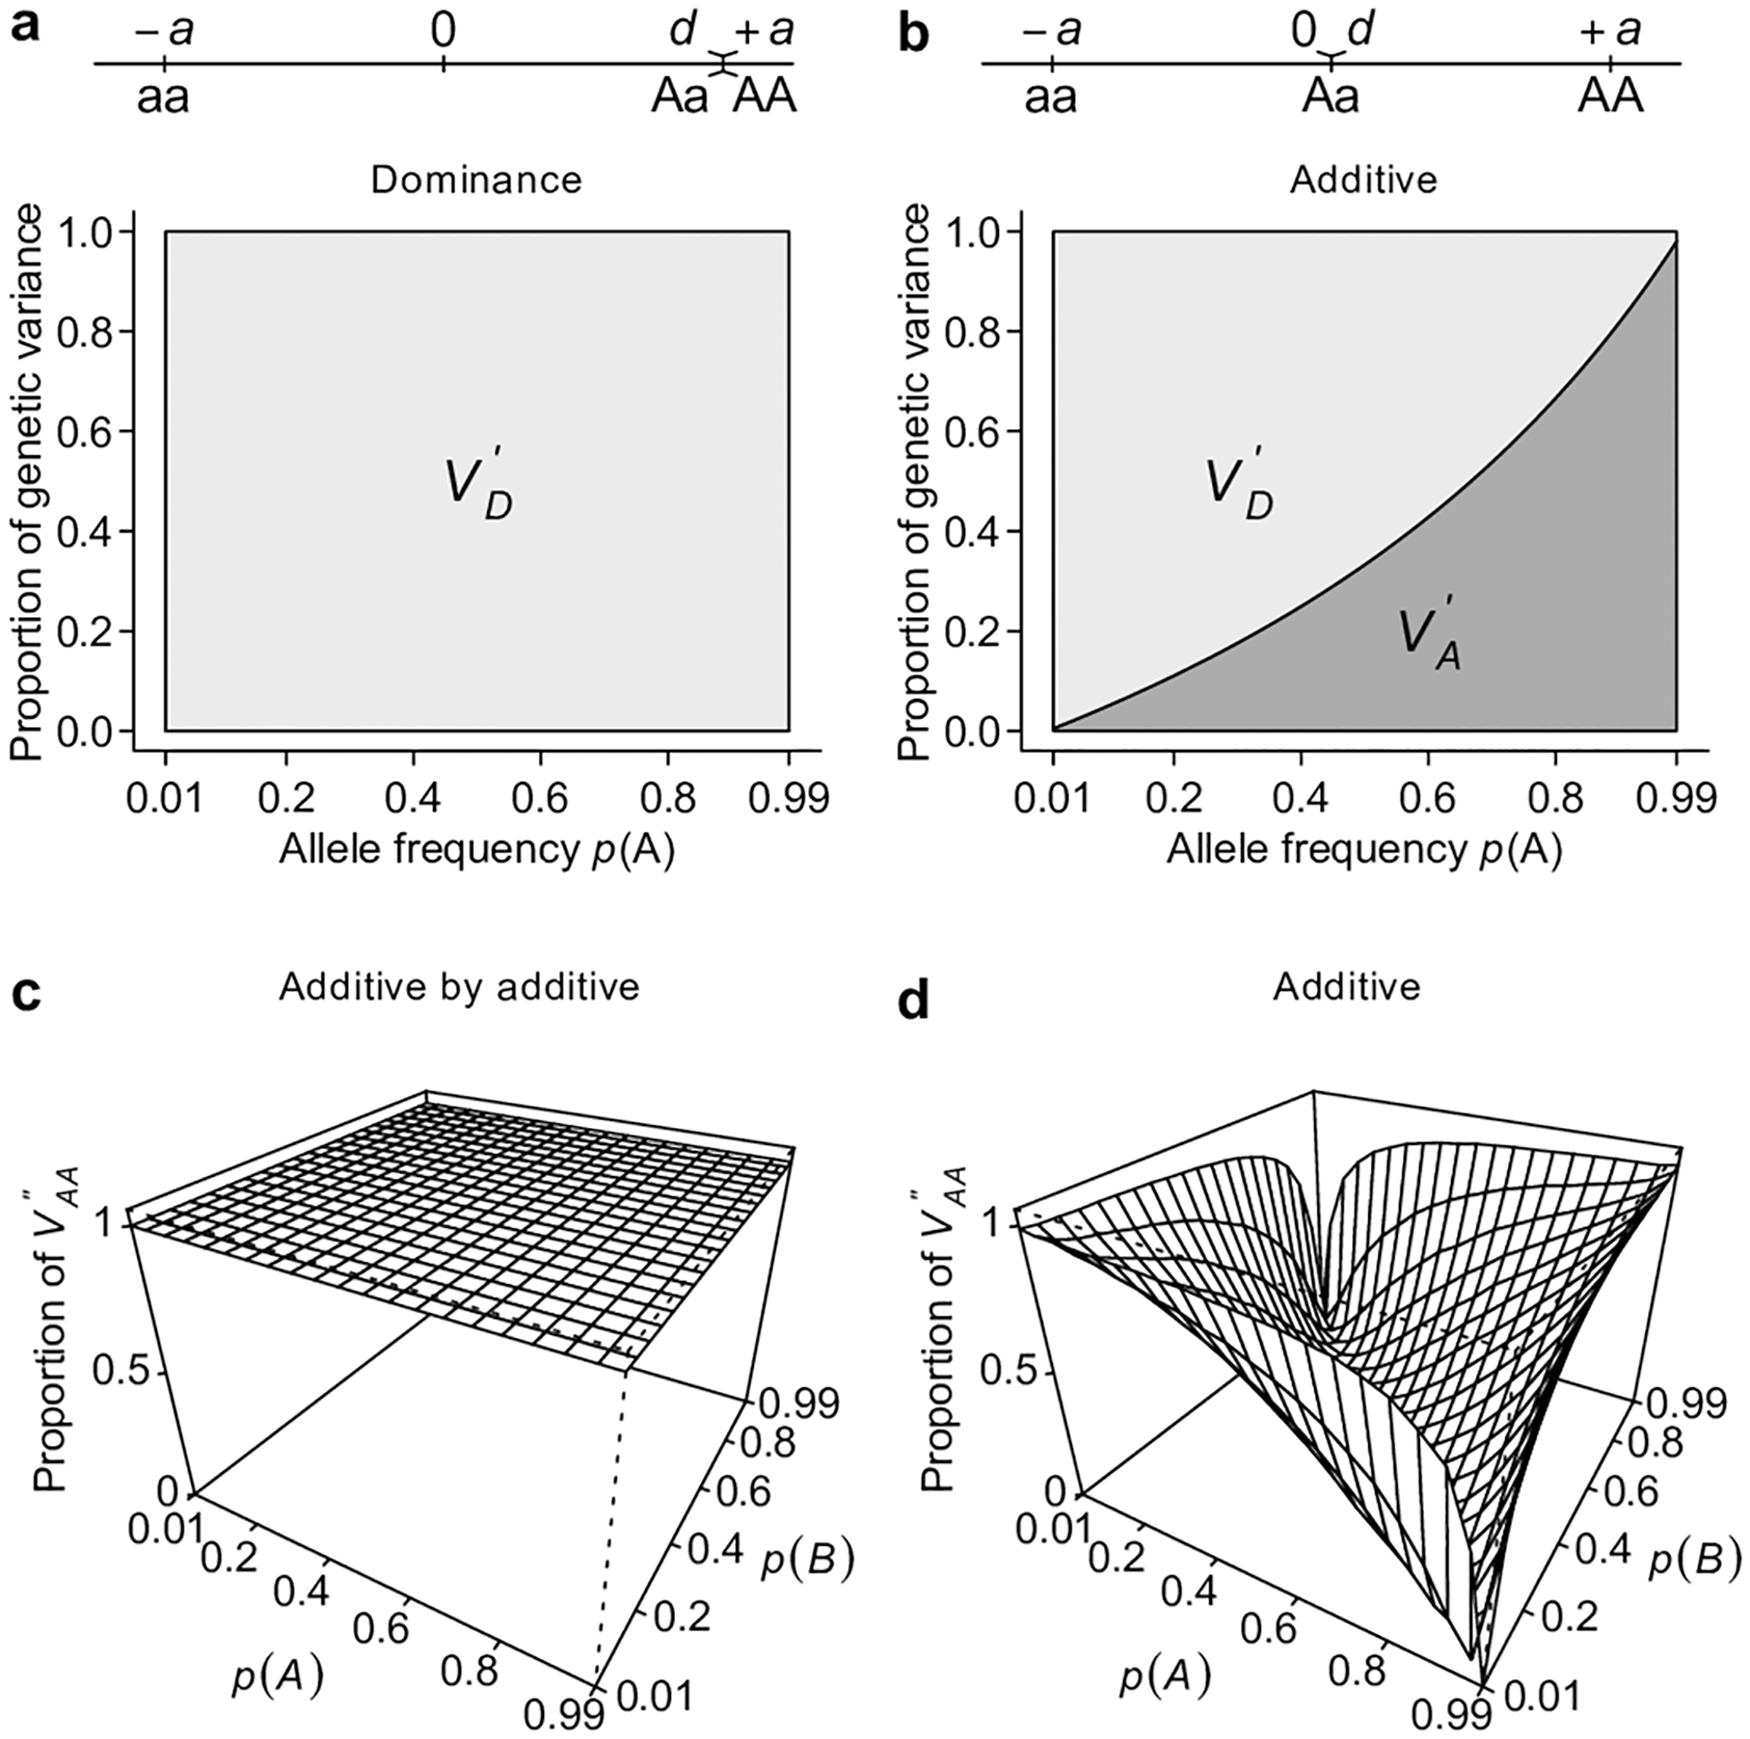 Alternative parameterizations capture the majority of genetic variance.